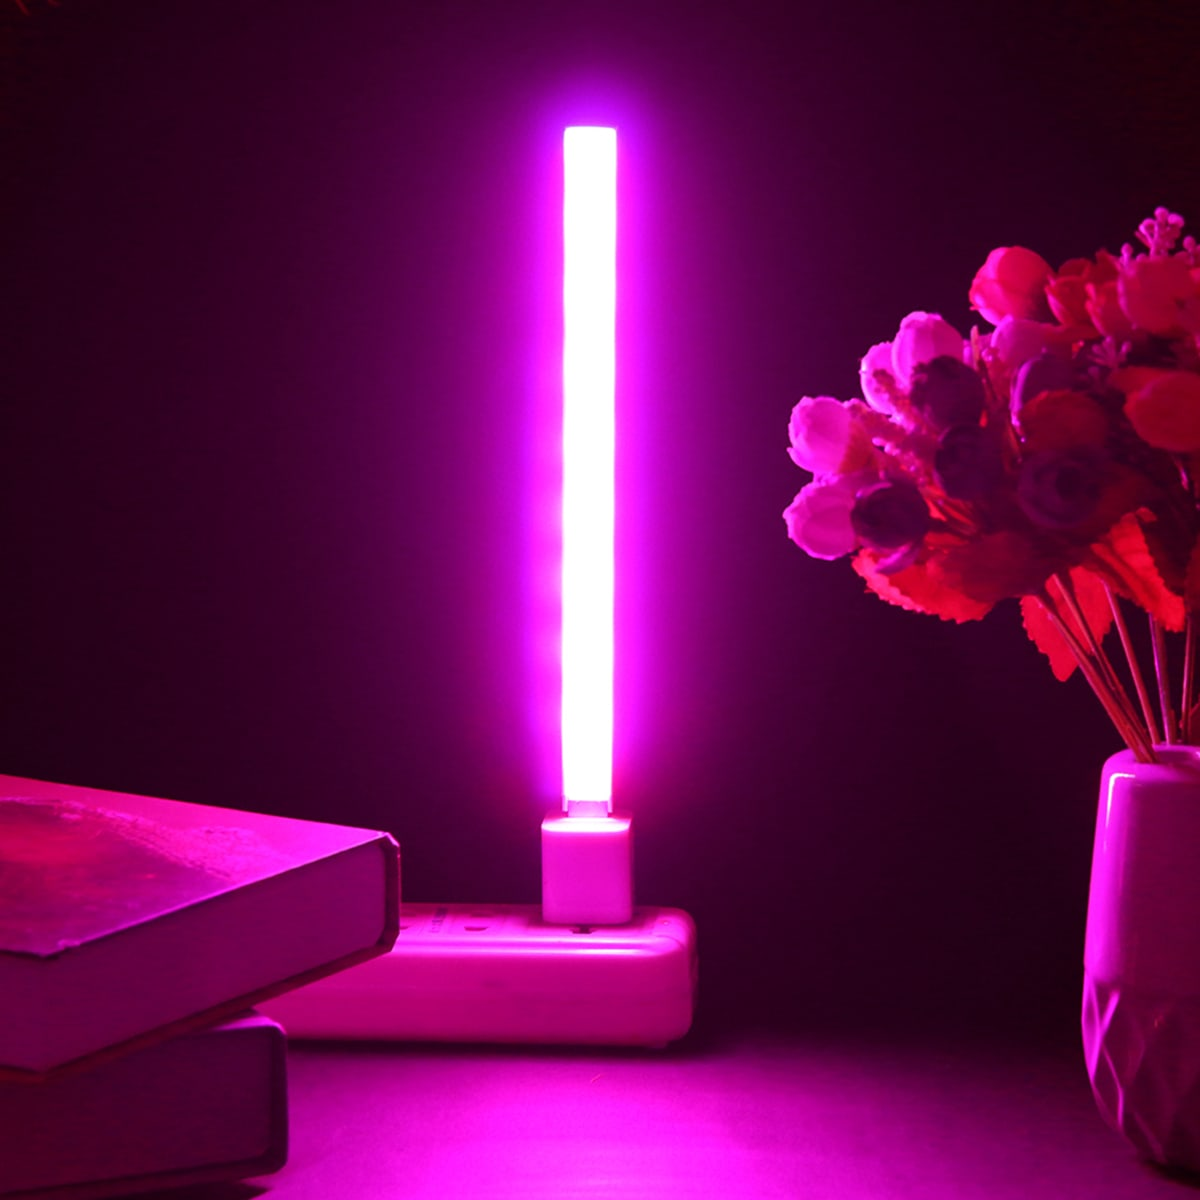 1 Stück USB LED-Licht